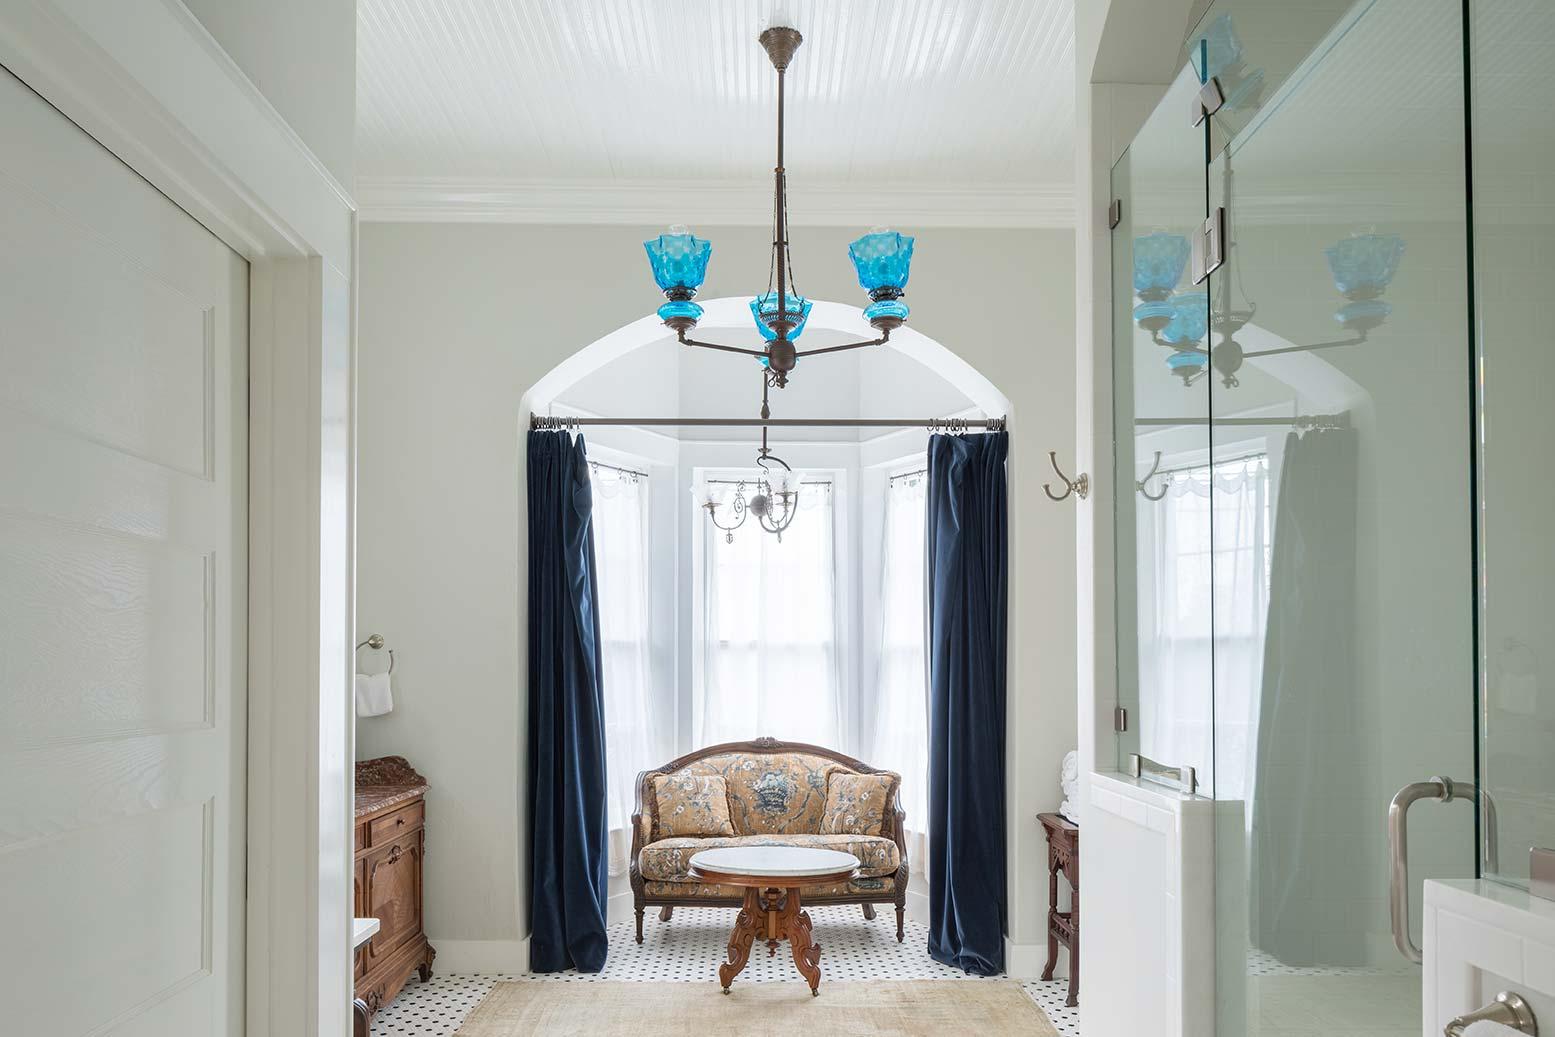 blacksmith-quarters-fredericksburg-realty-texas-commercial-real-estate-for-sale-natural-light-wedding-venue-investment-hospitality-tourism.jpg